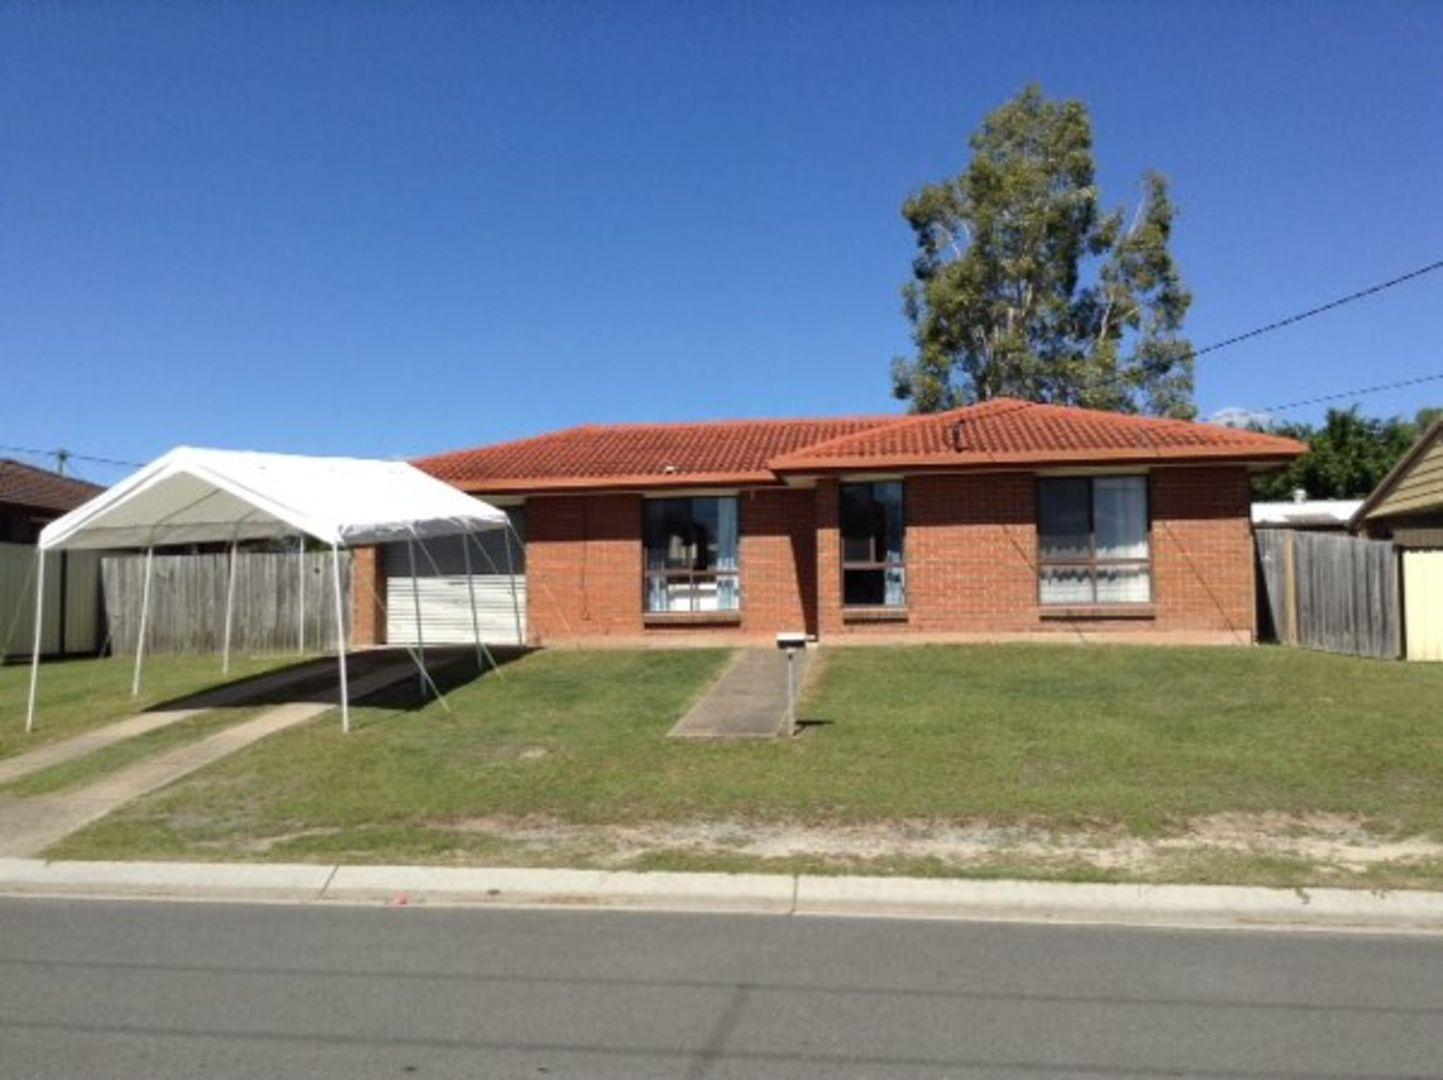 28 Cavillon Street, Crestmead QLD 4132, Image 0